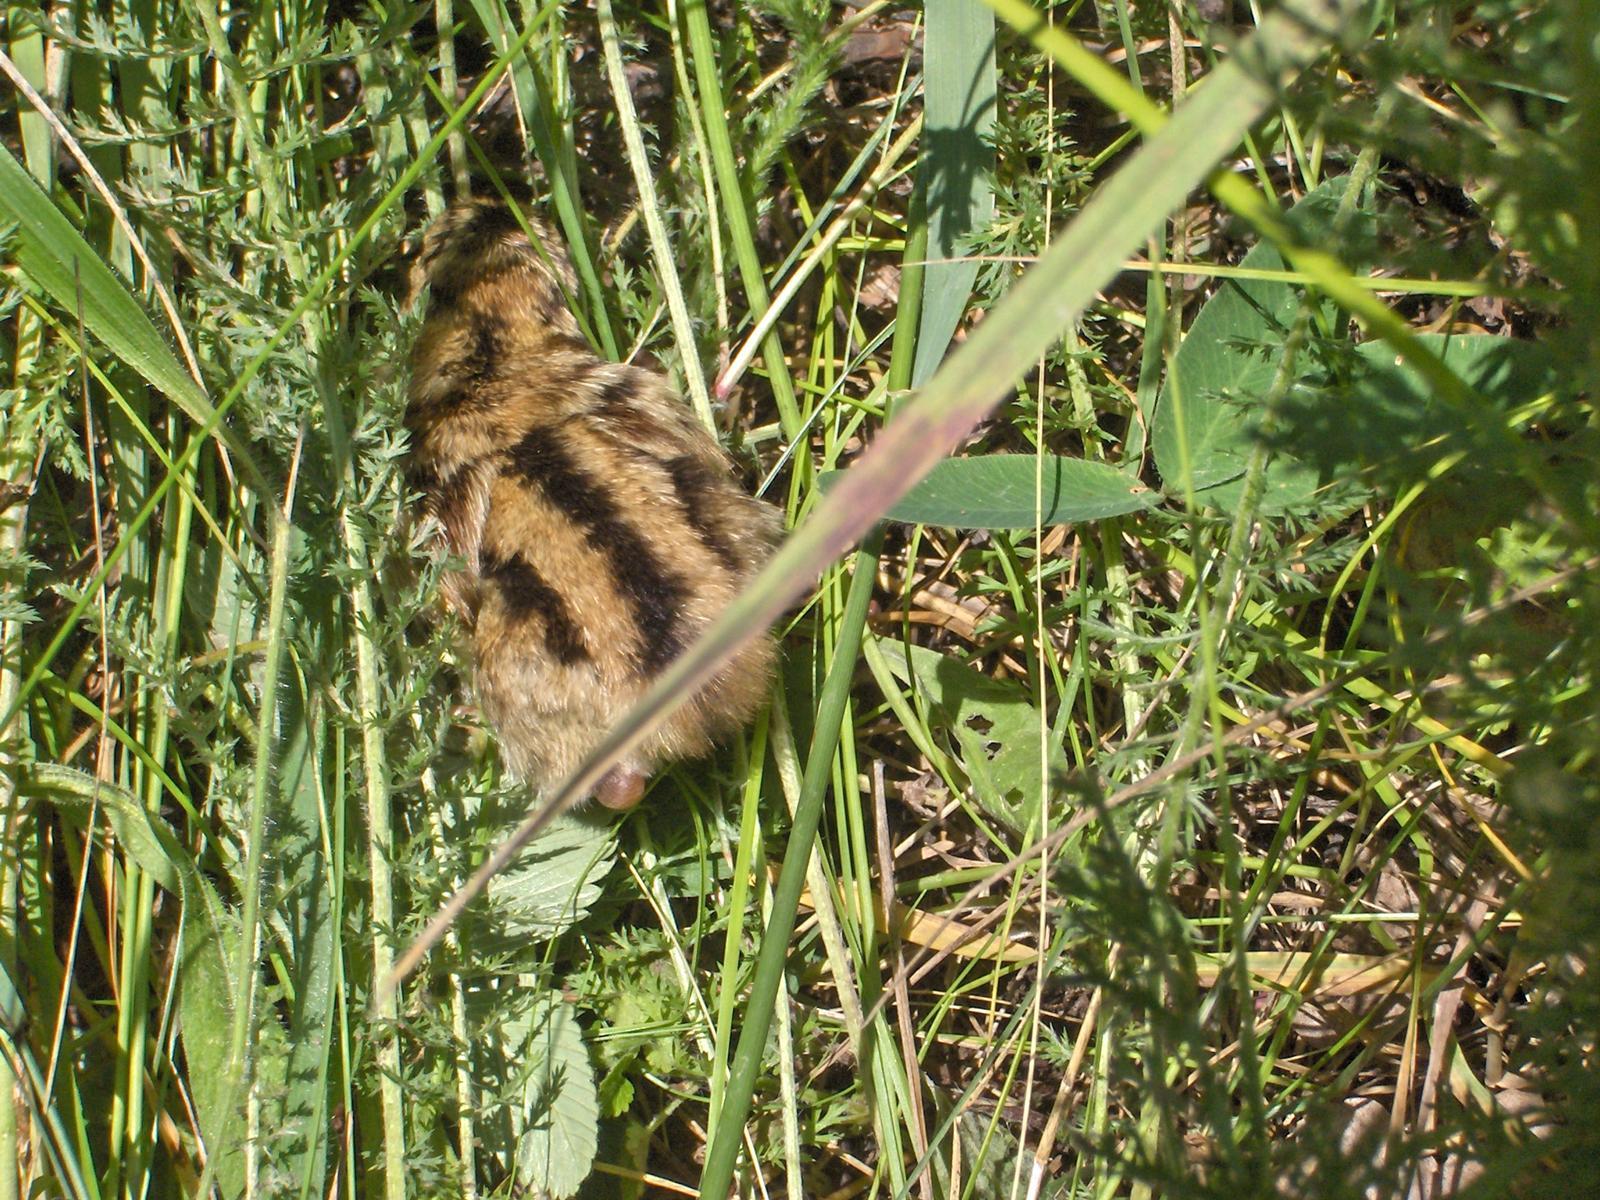 Un pui de fazan in iarba